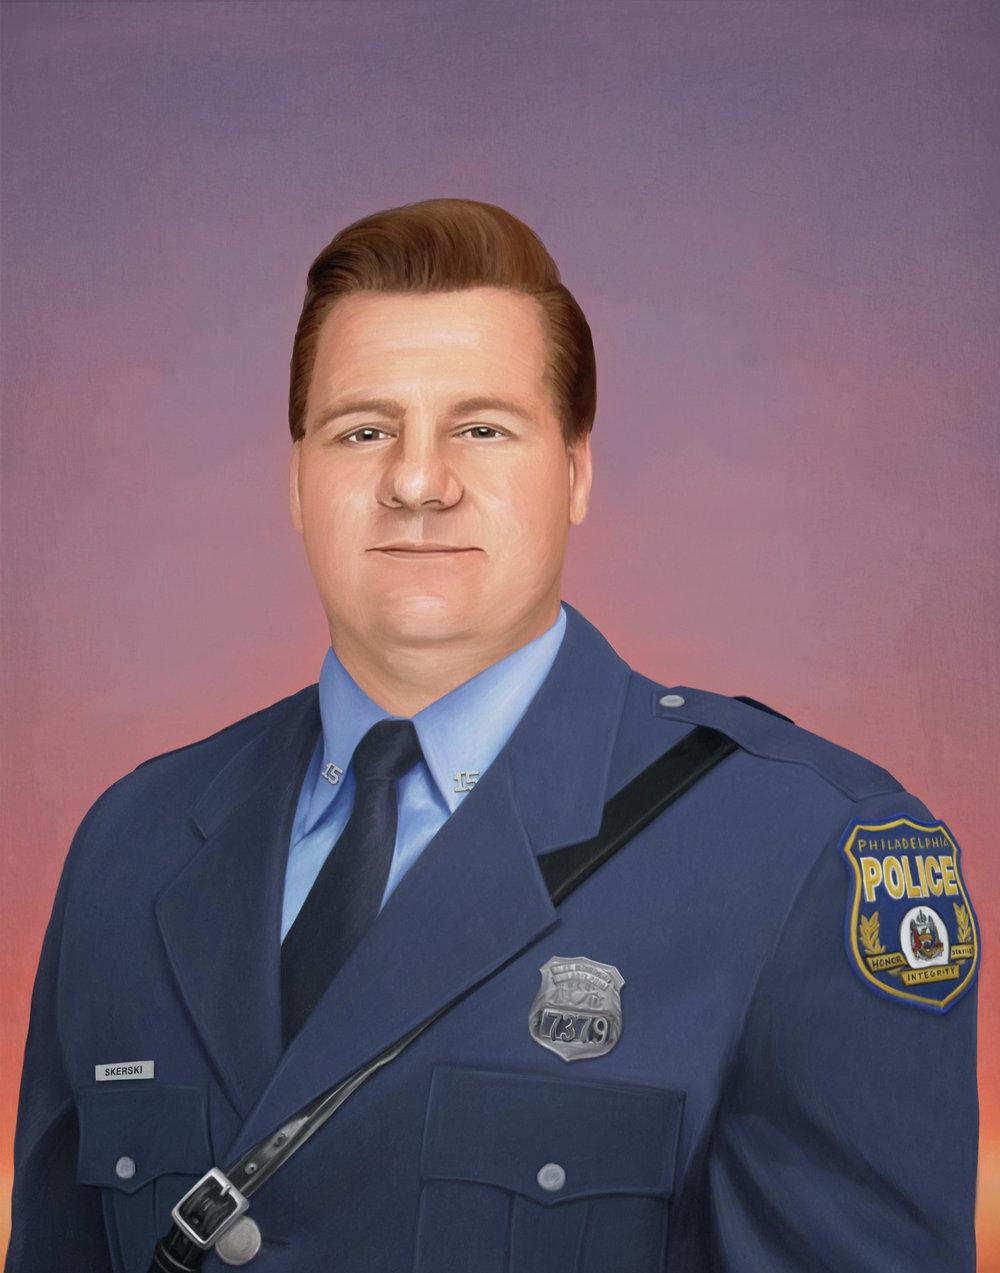 A PHILADELPHIA HERO - PORTRAIT OF POLICE OFFICER GARY SKERSKI, PO